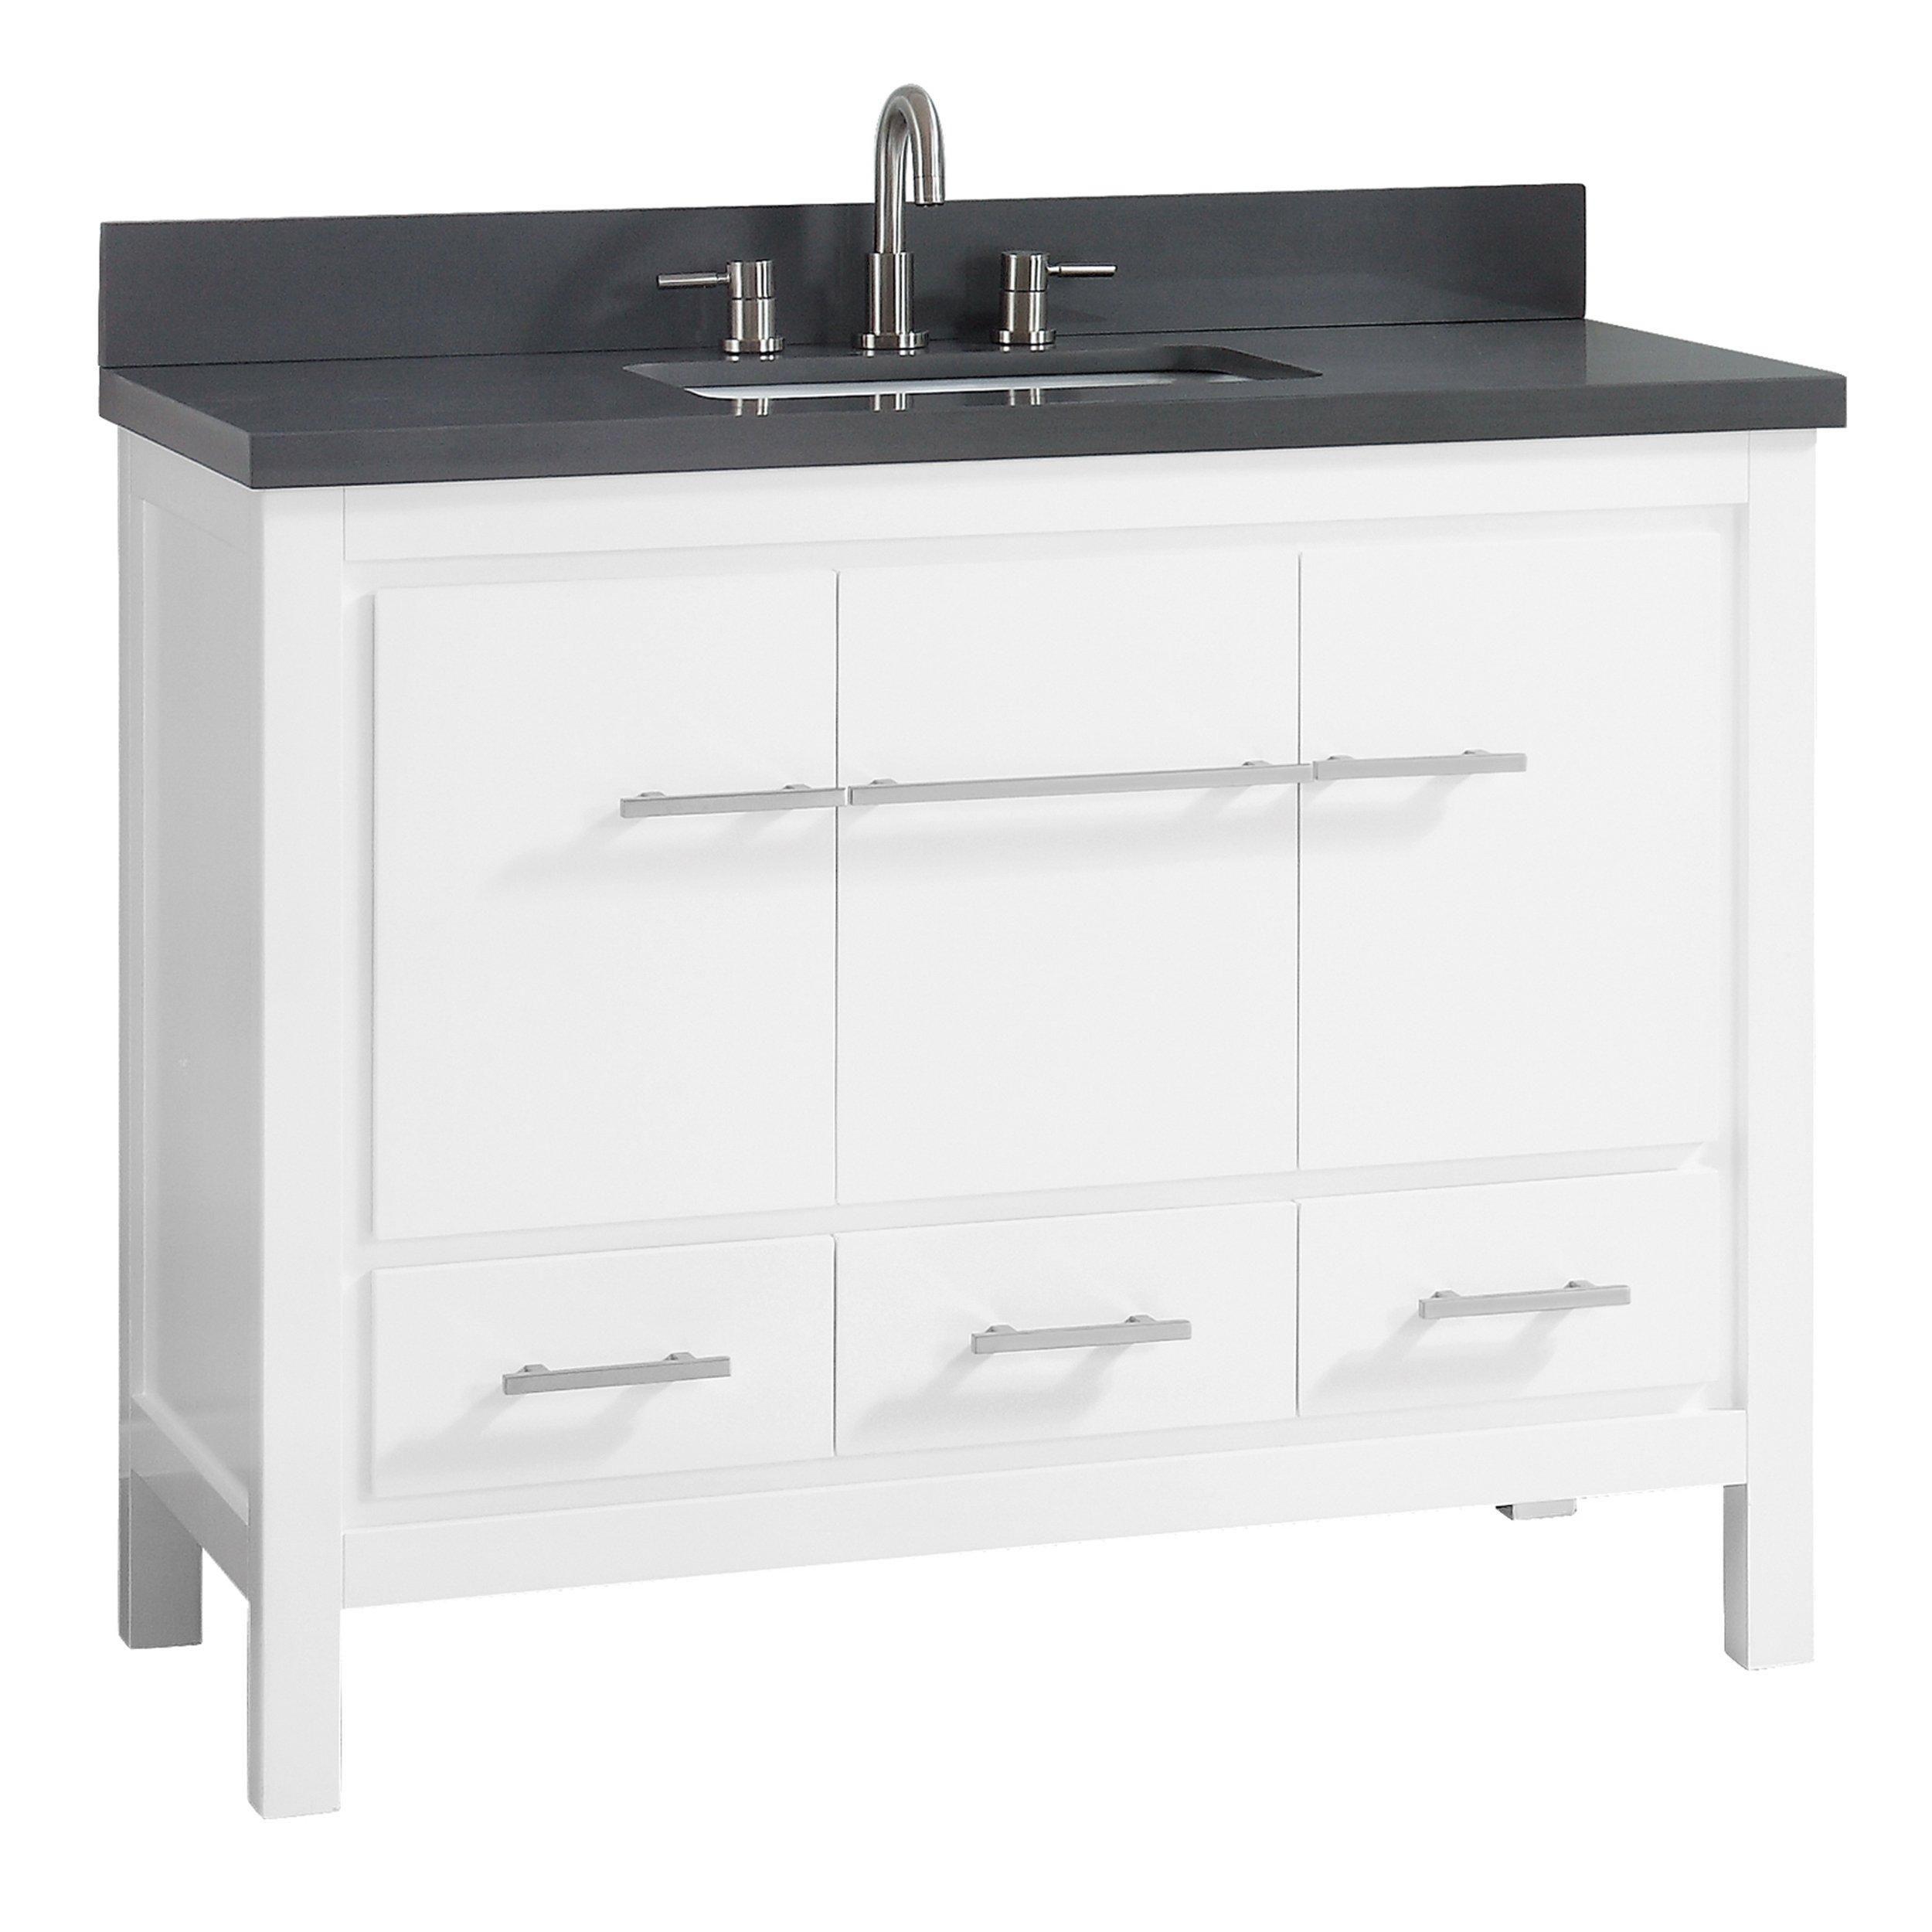 Ryder 43 In White Single Vanity With Gray Quartz Top In 2021 Single Bathroom Vanity Bathroom Vanity Vanity Set